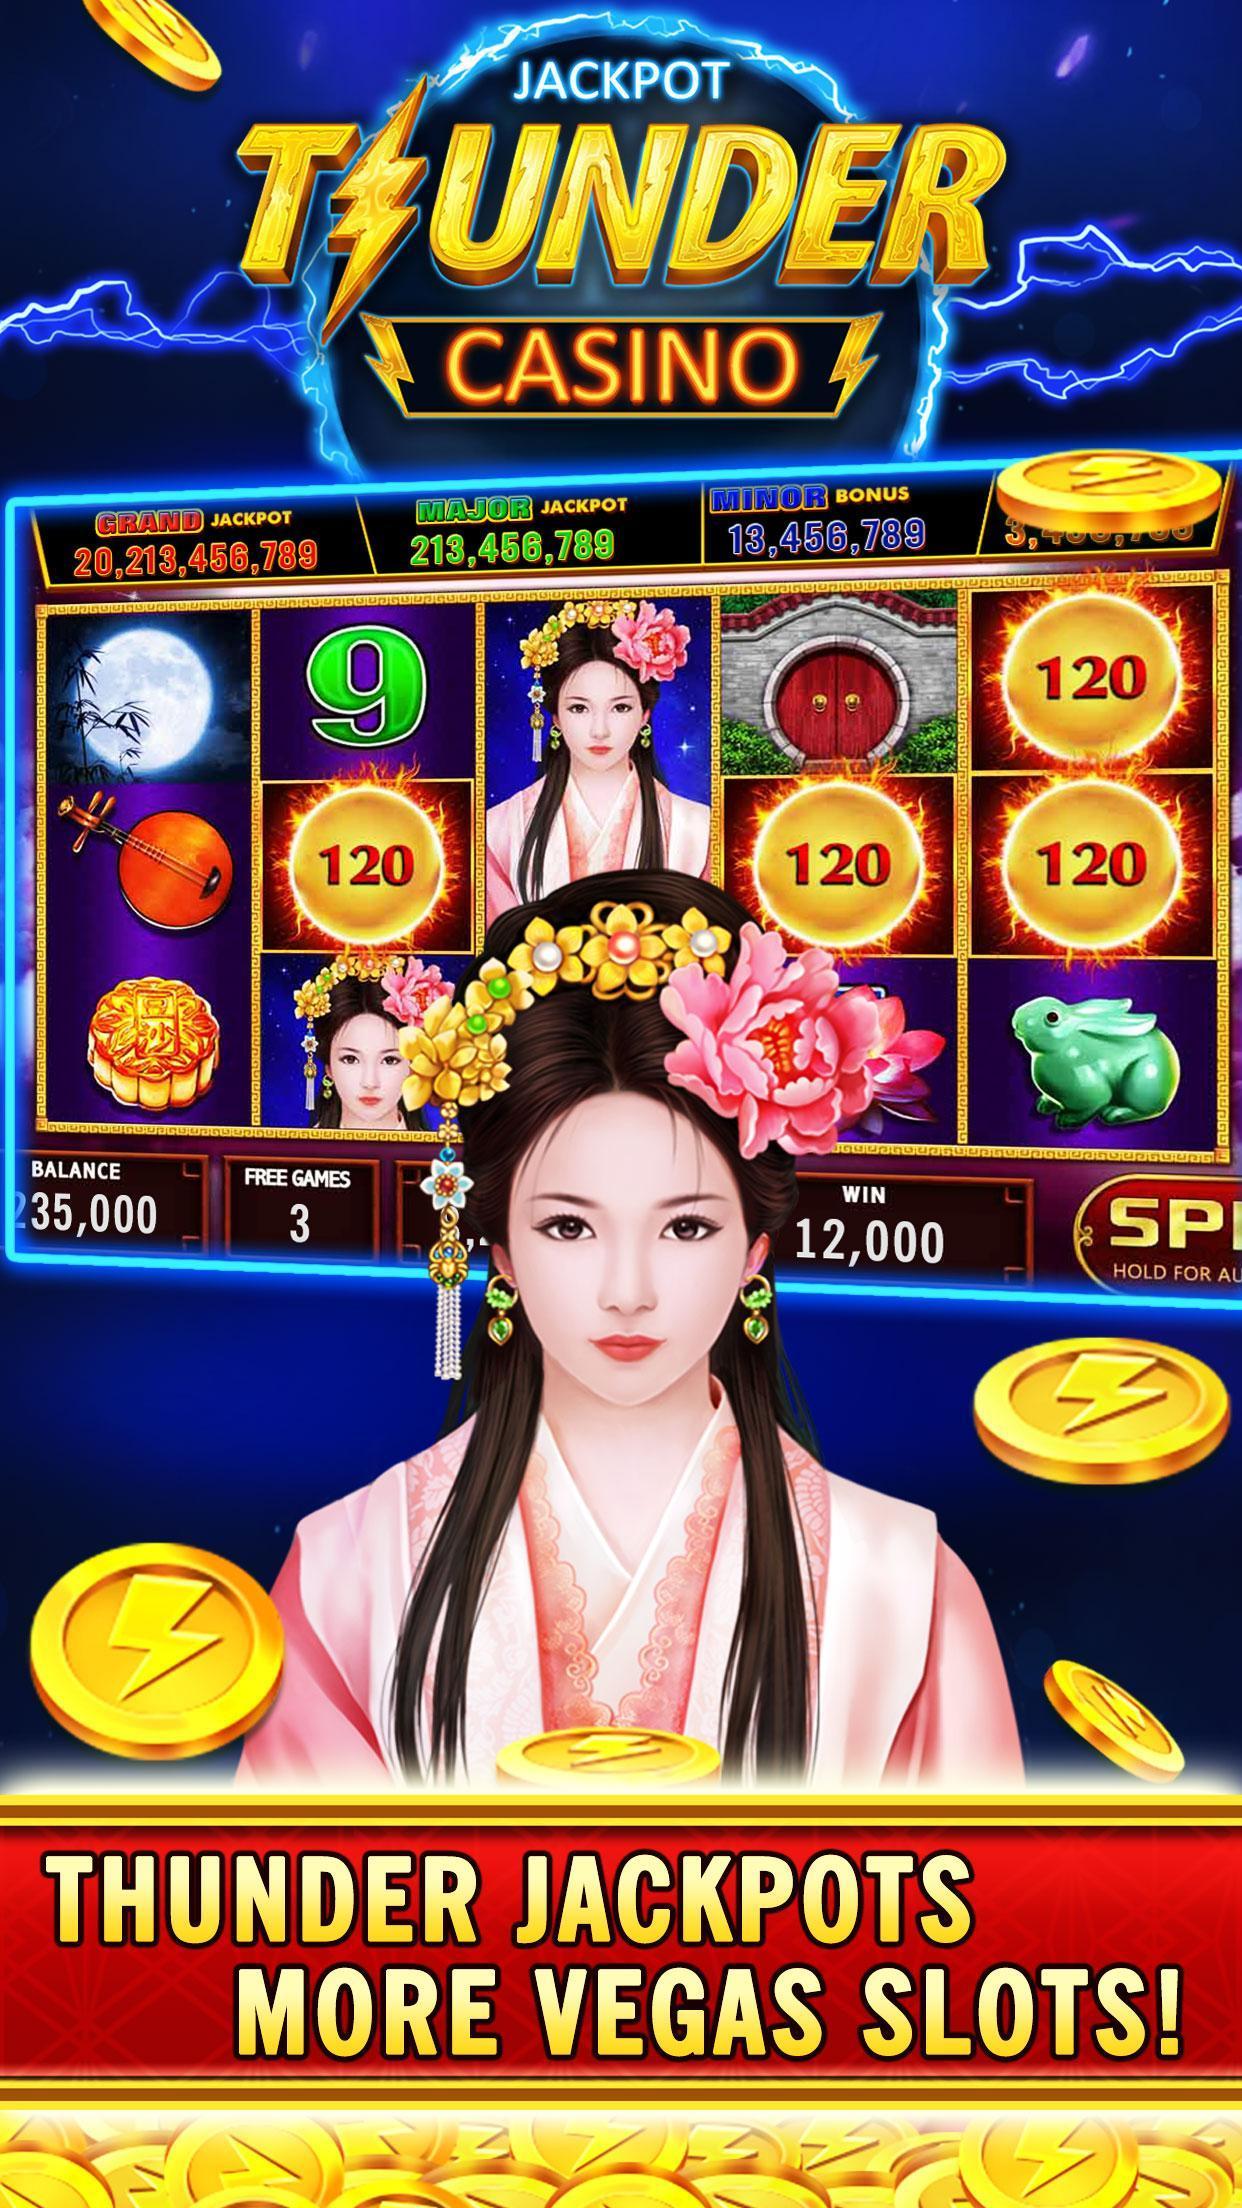 Europa casino mobile bonus